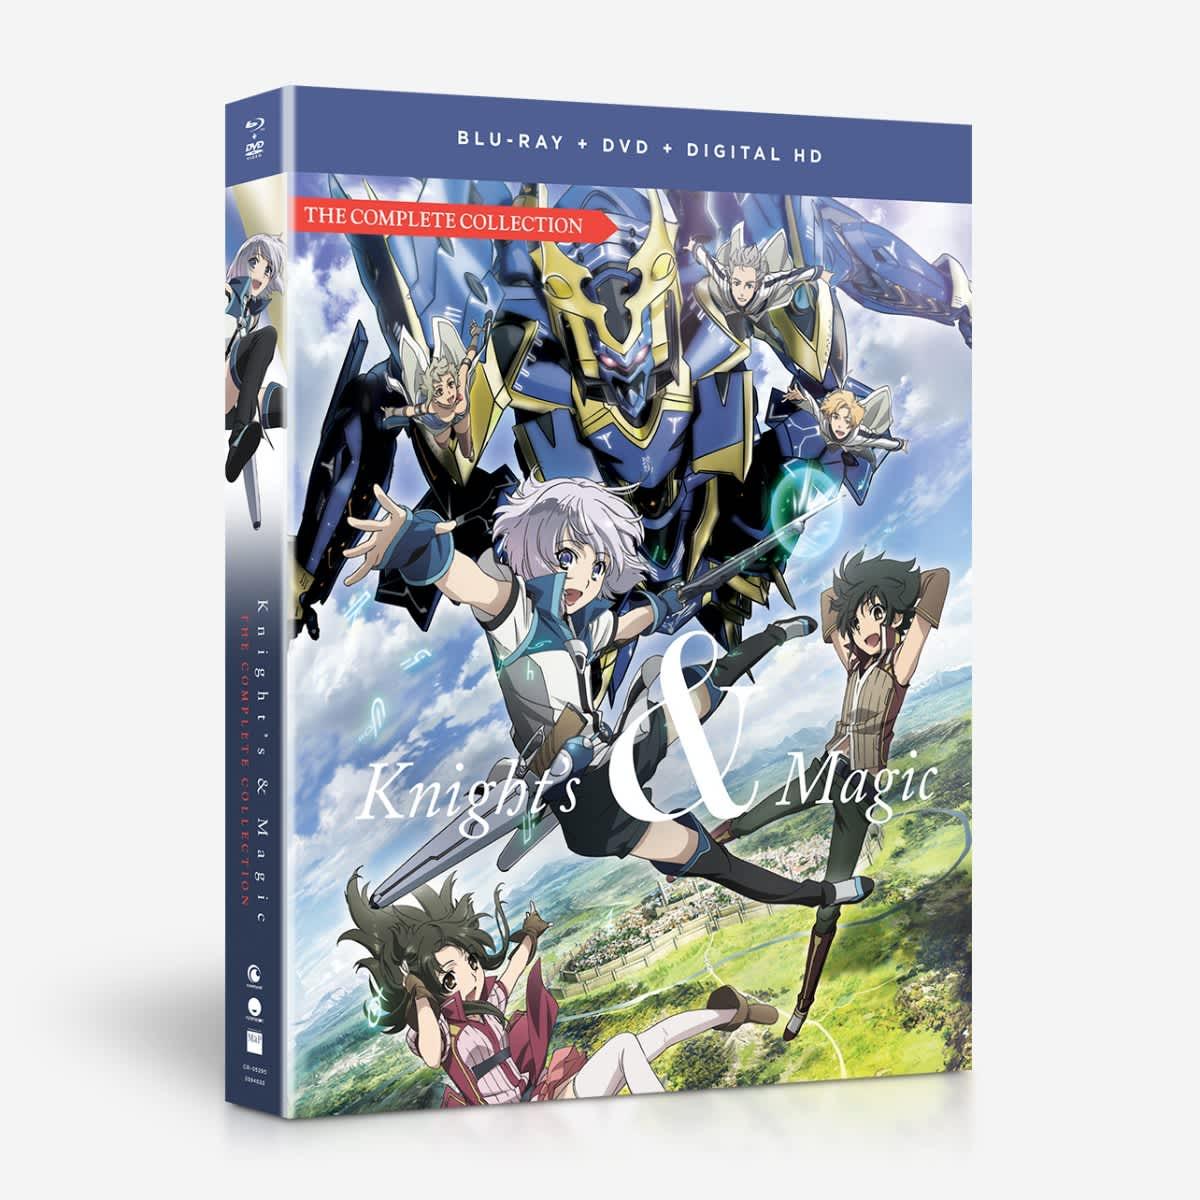 Knight's & Magic Blu-ray/DVD